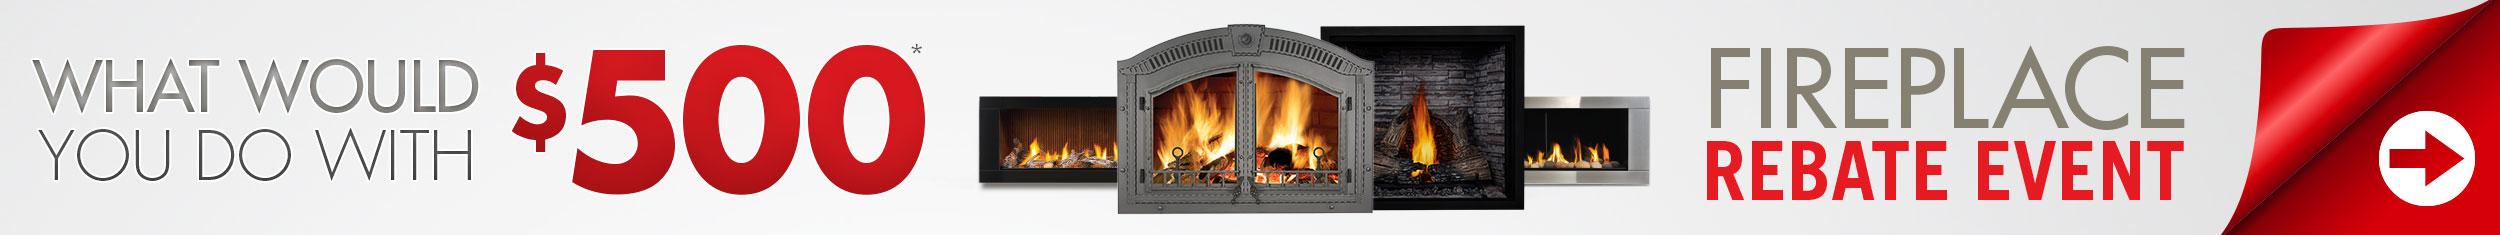 2500x235-promo-banner-napoleon-fireplaces